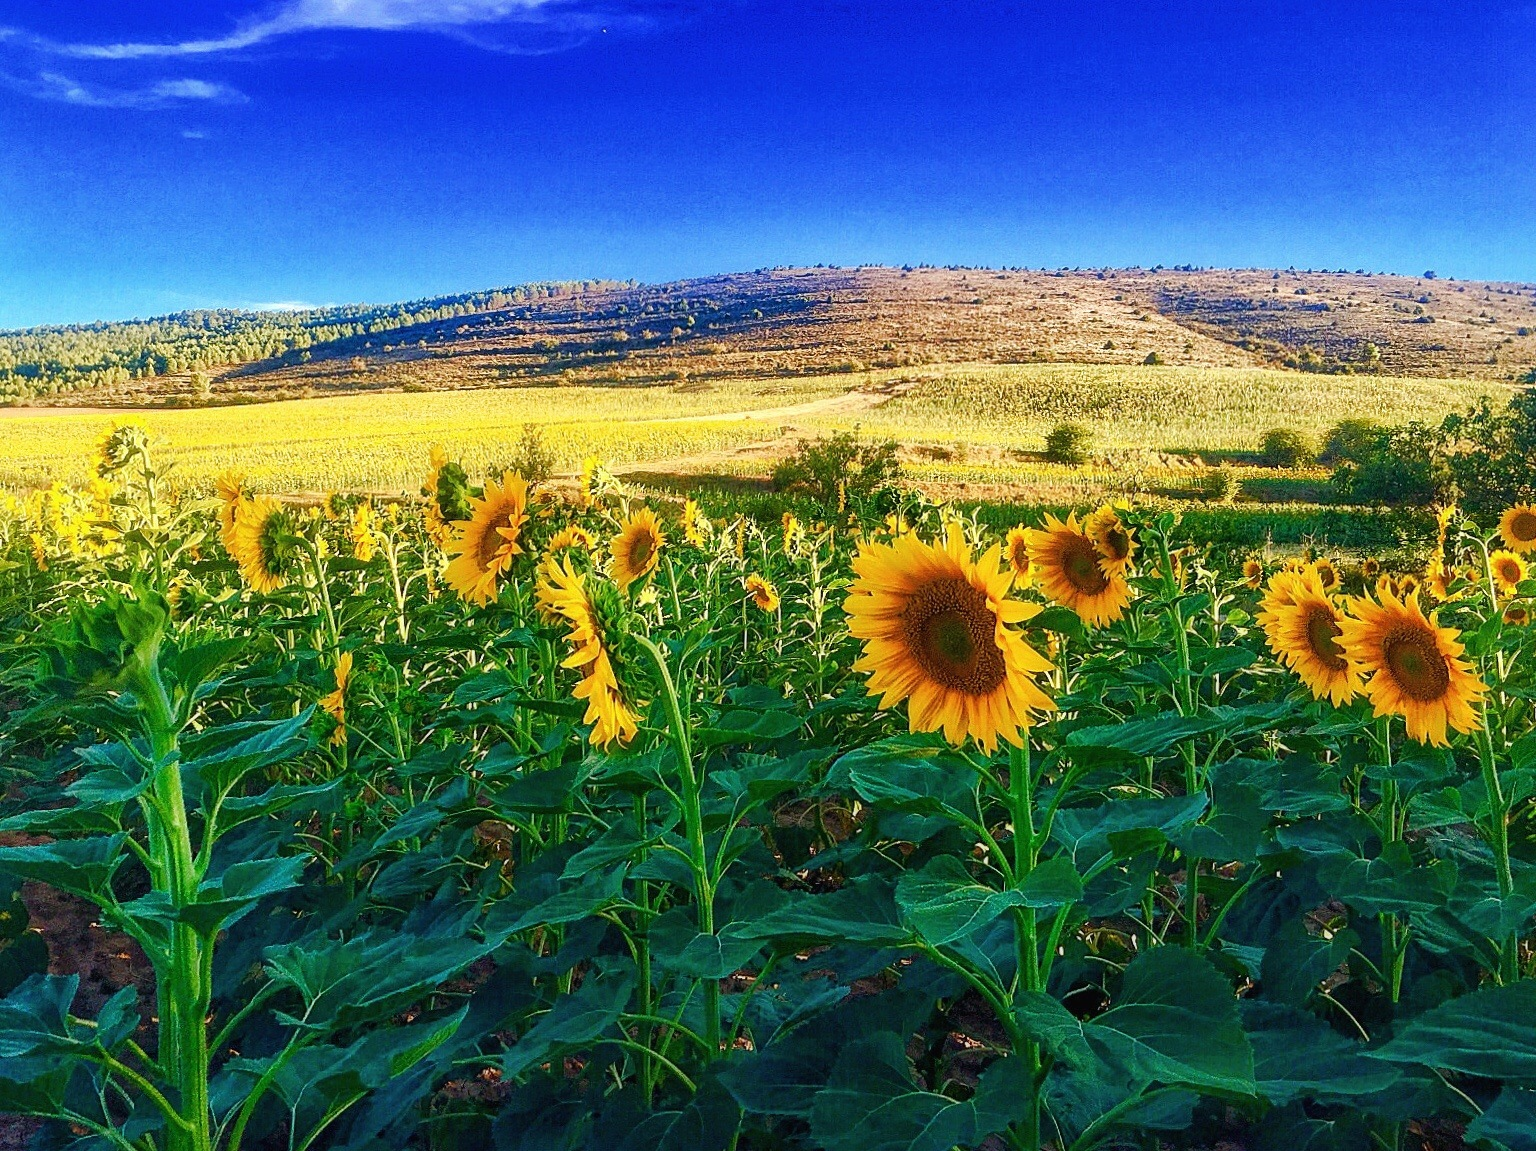 Sunflowers  by Gregorio Emper